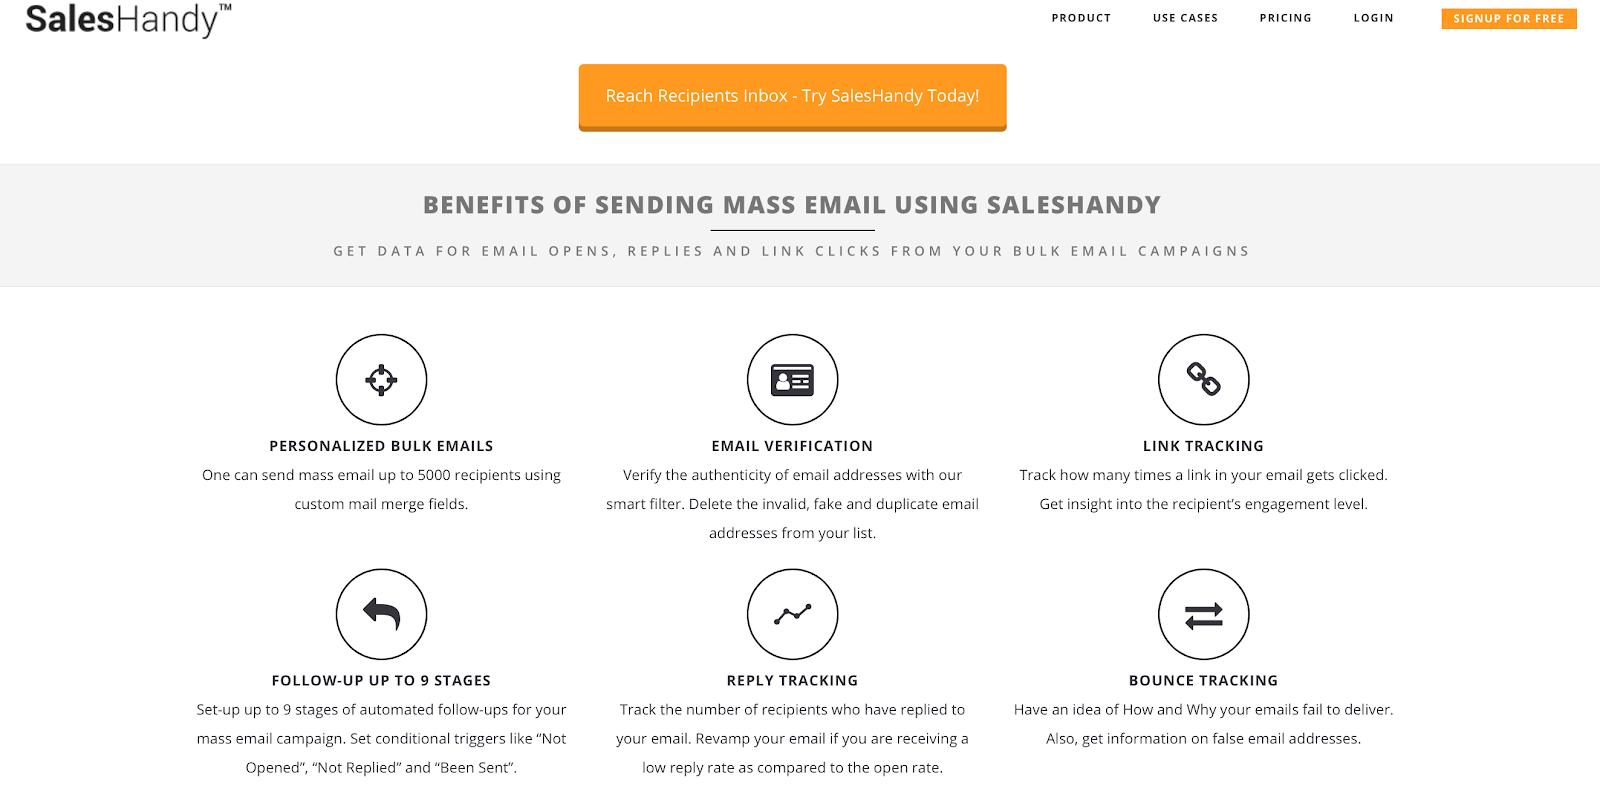 SalesHandy email sharing benefits